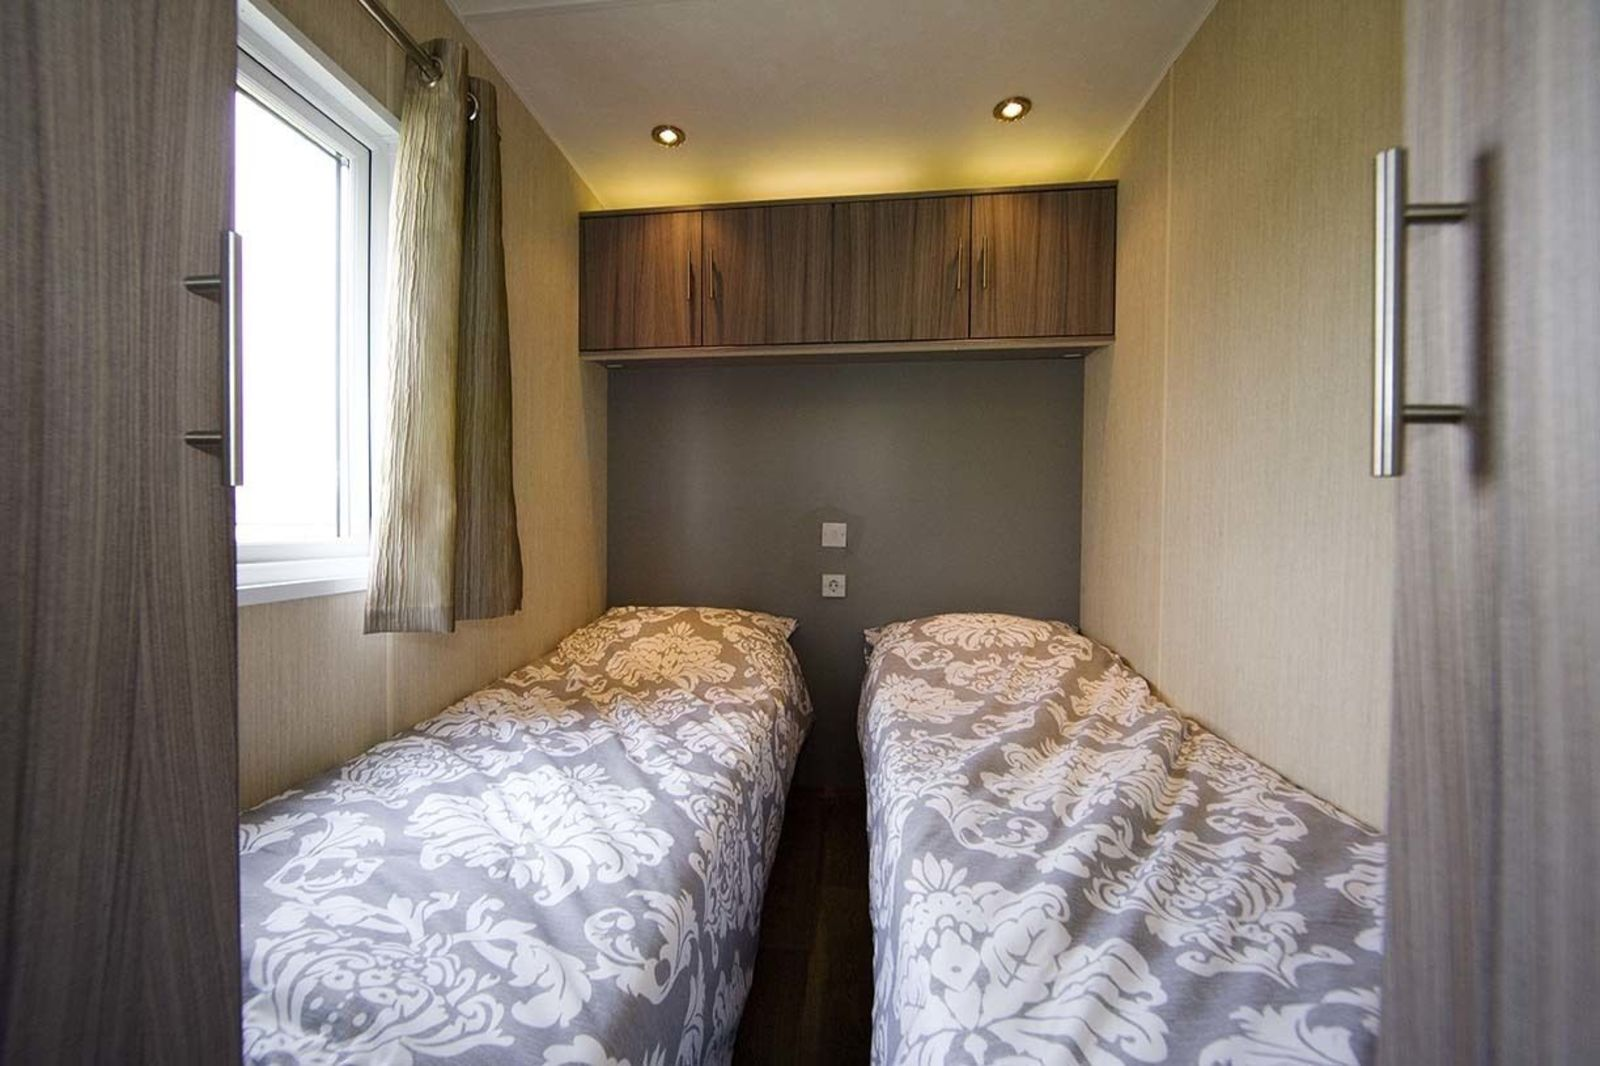 Bungalette 4 personen sauna